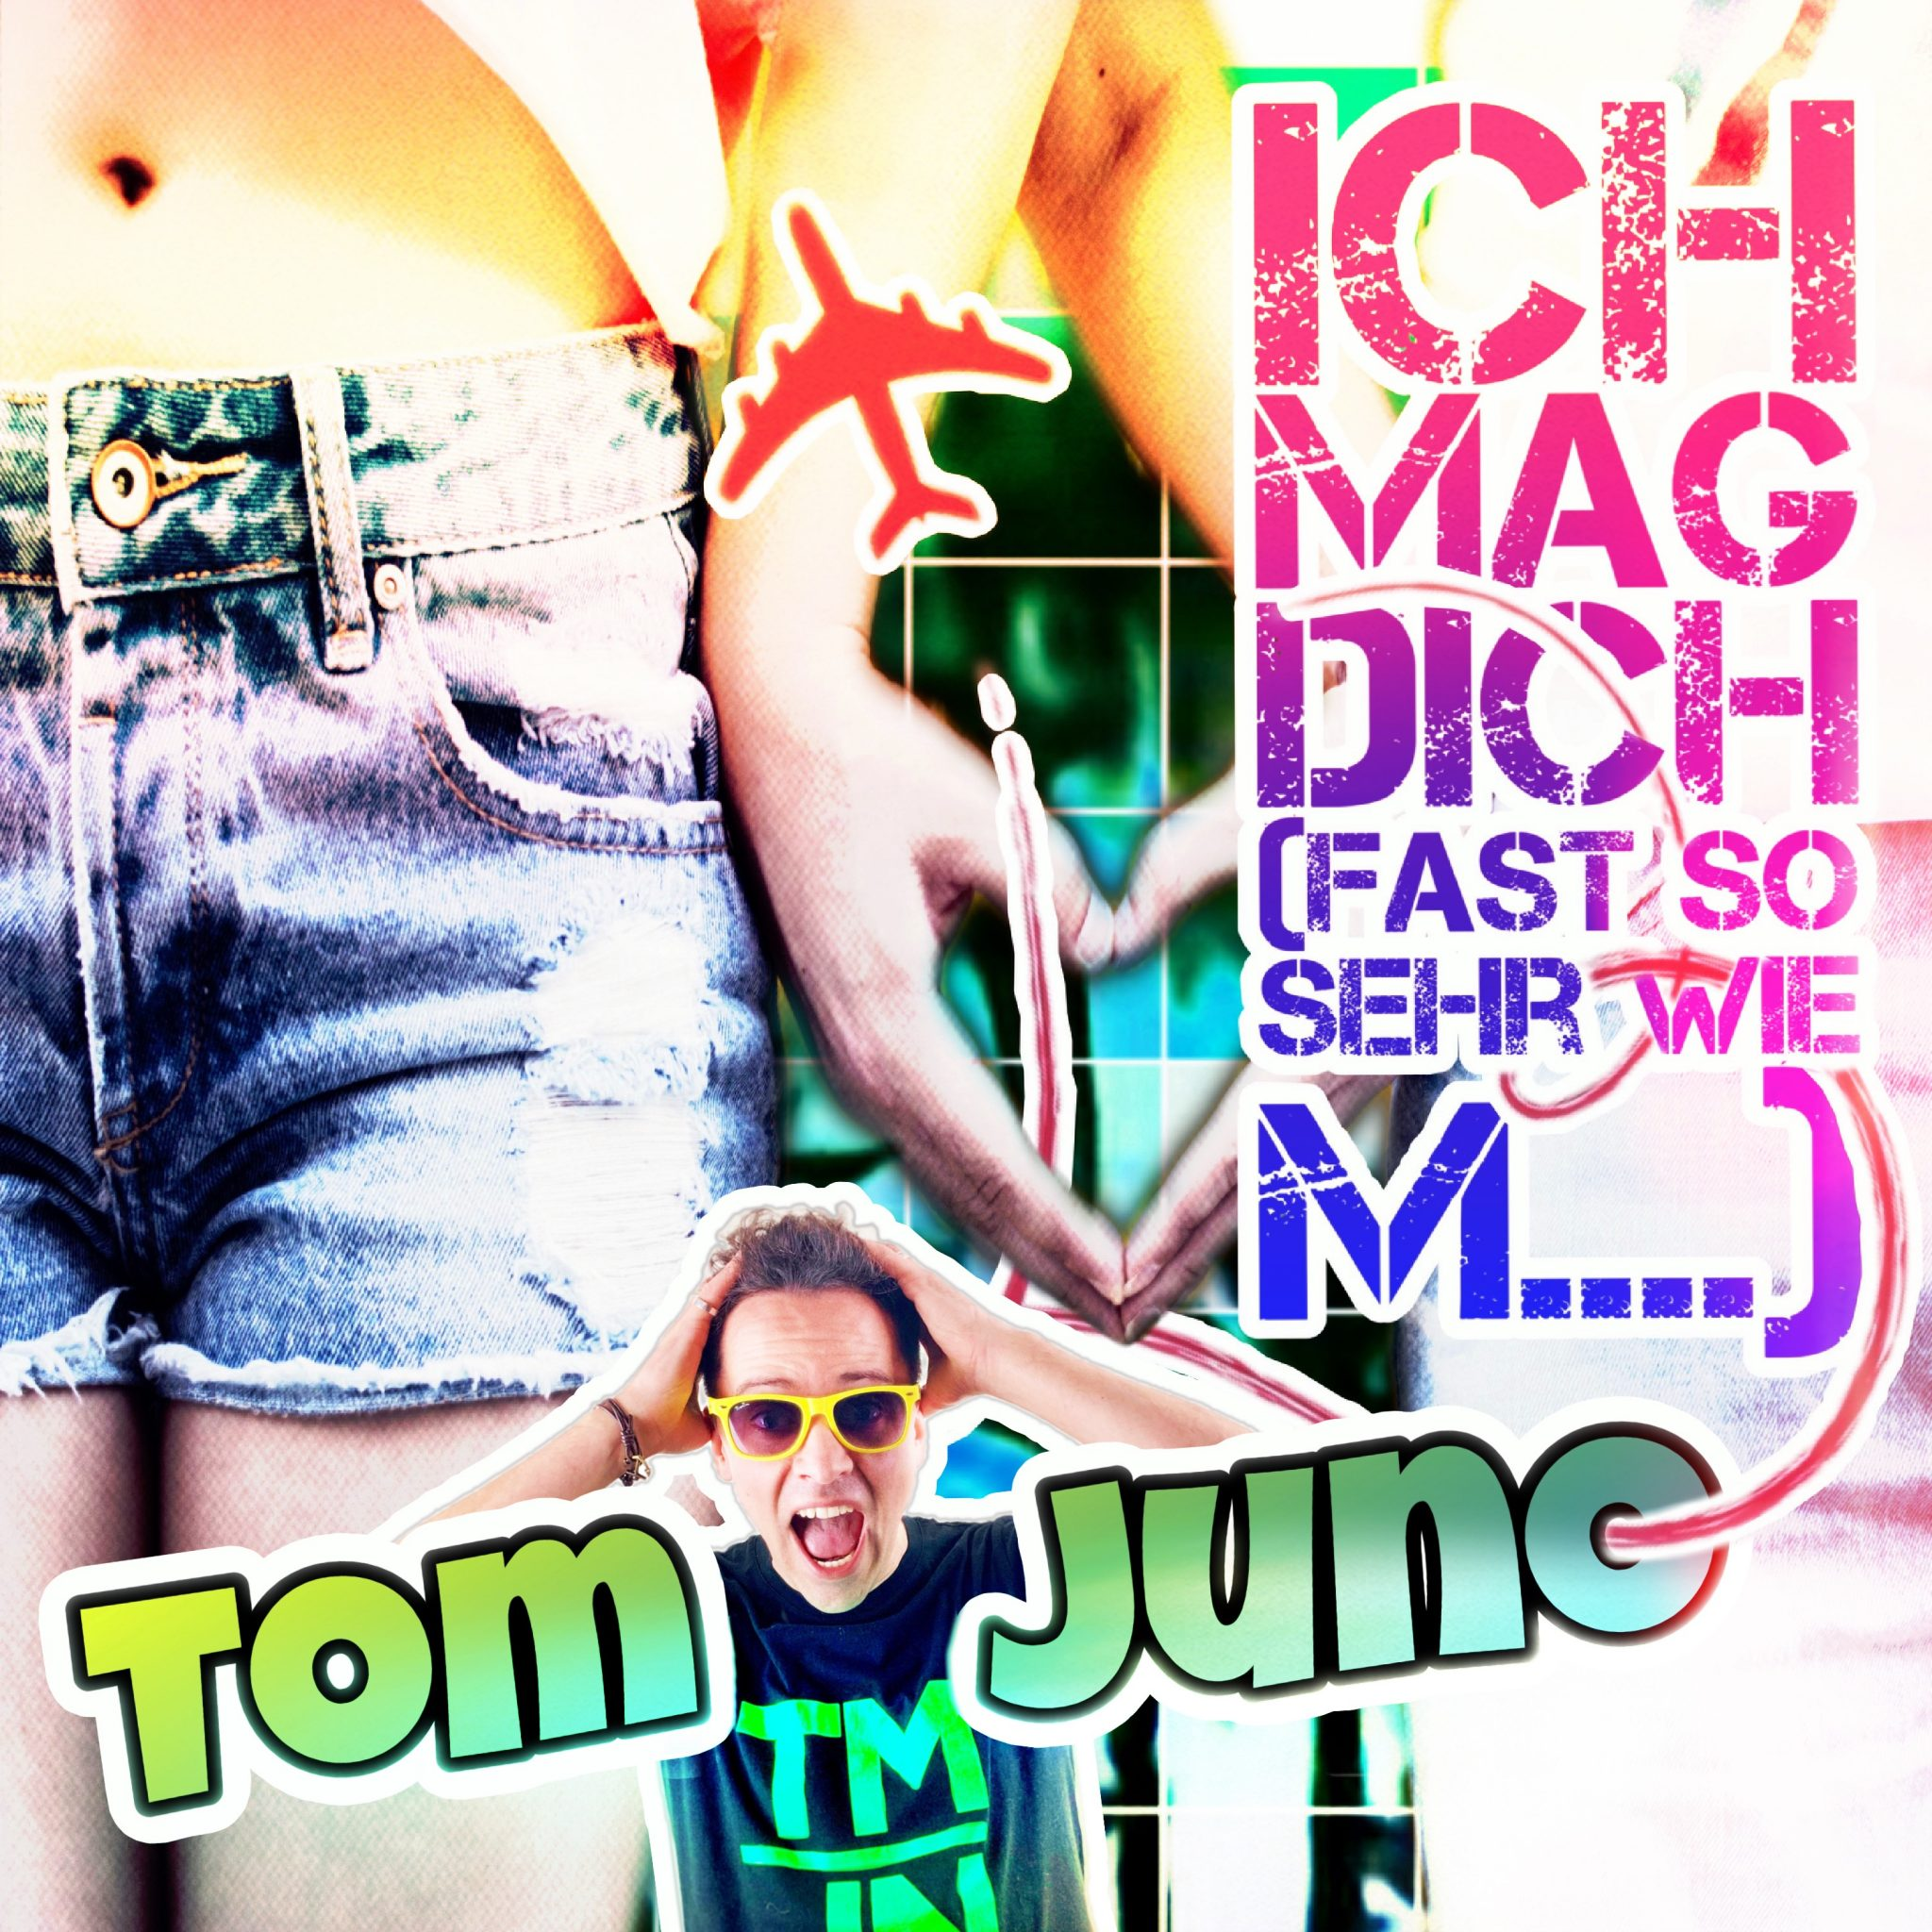 Ich mag Dich (fast so sehr wie M..) - Tom Juno   Xtreme